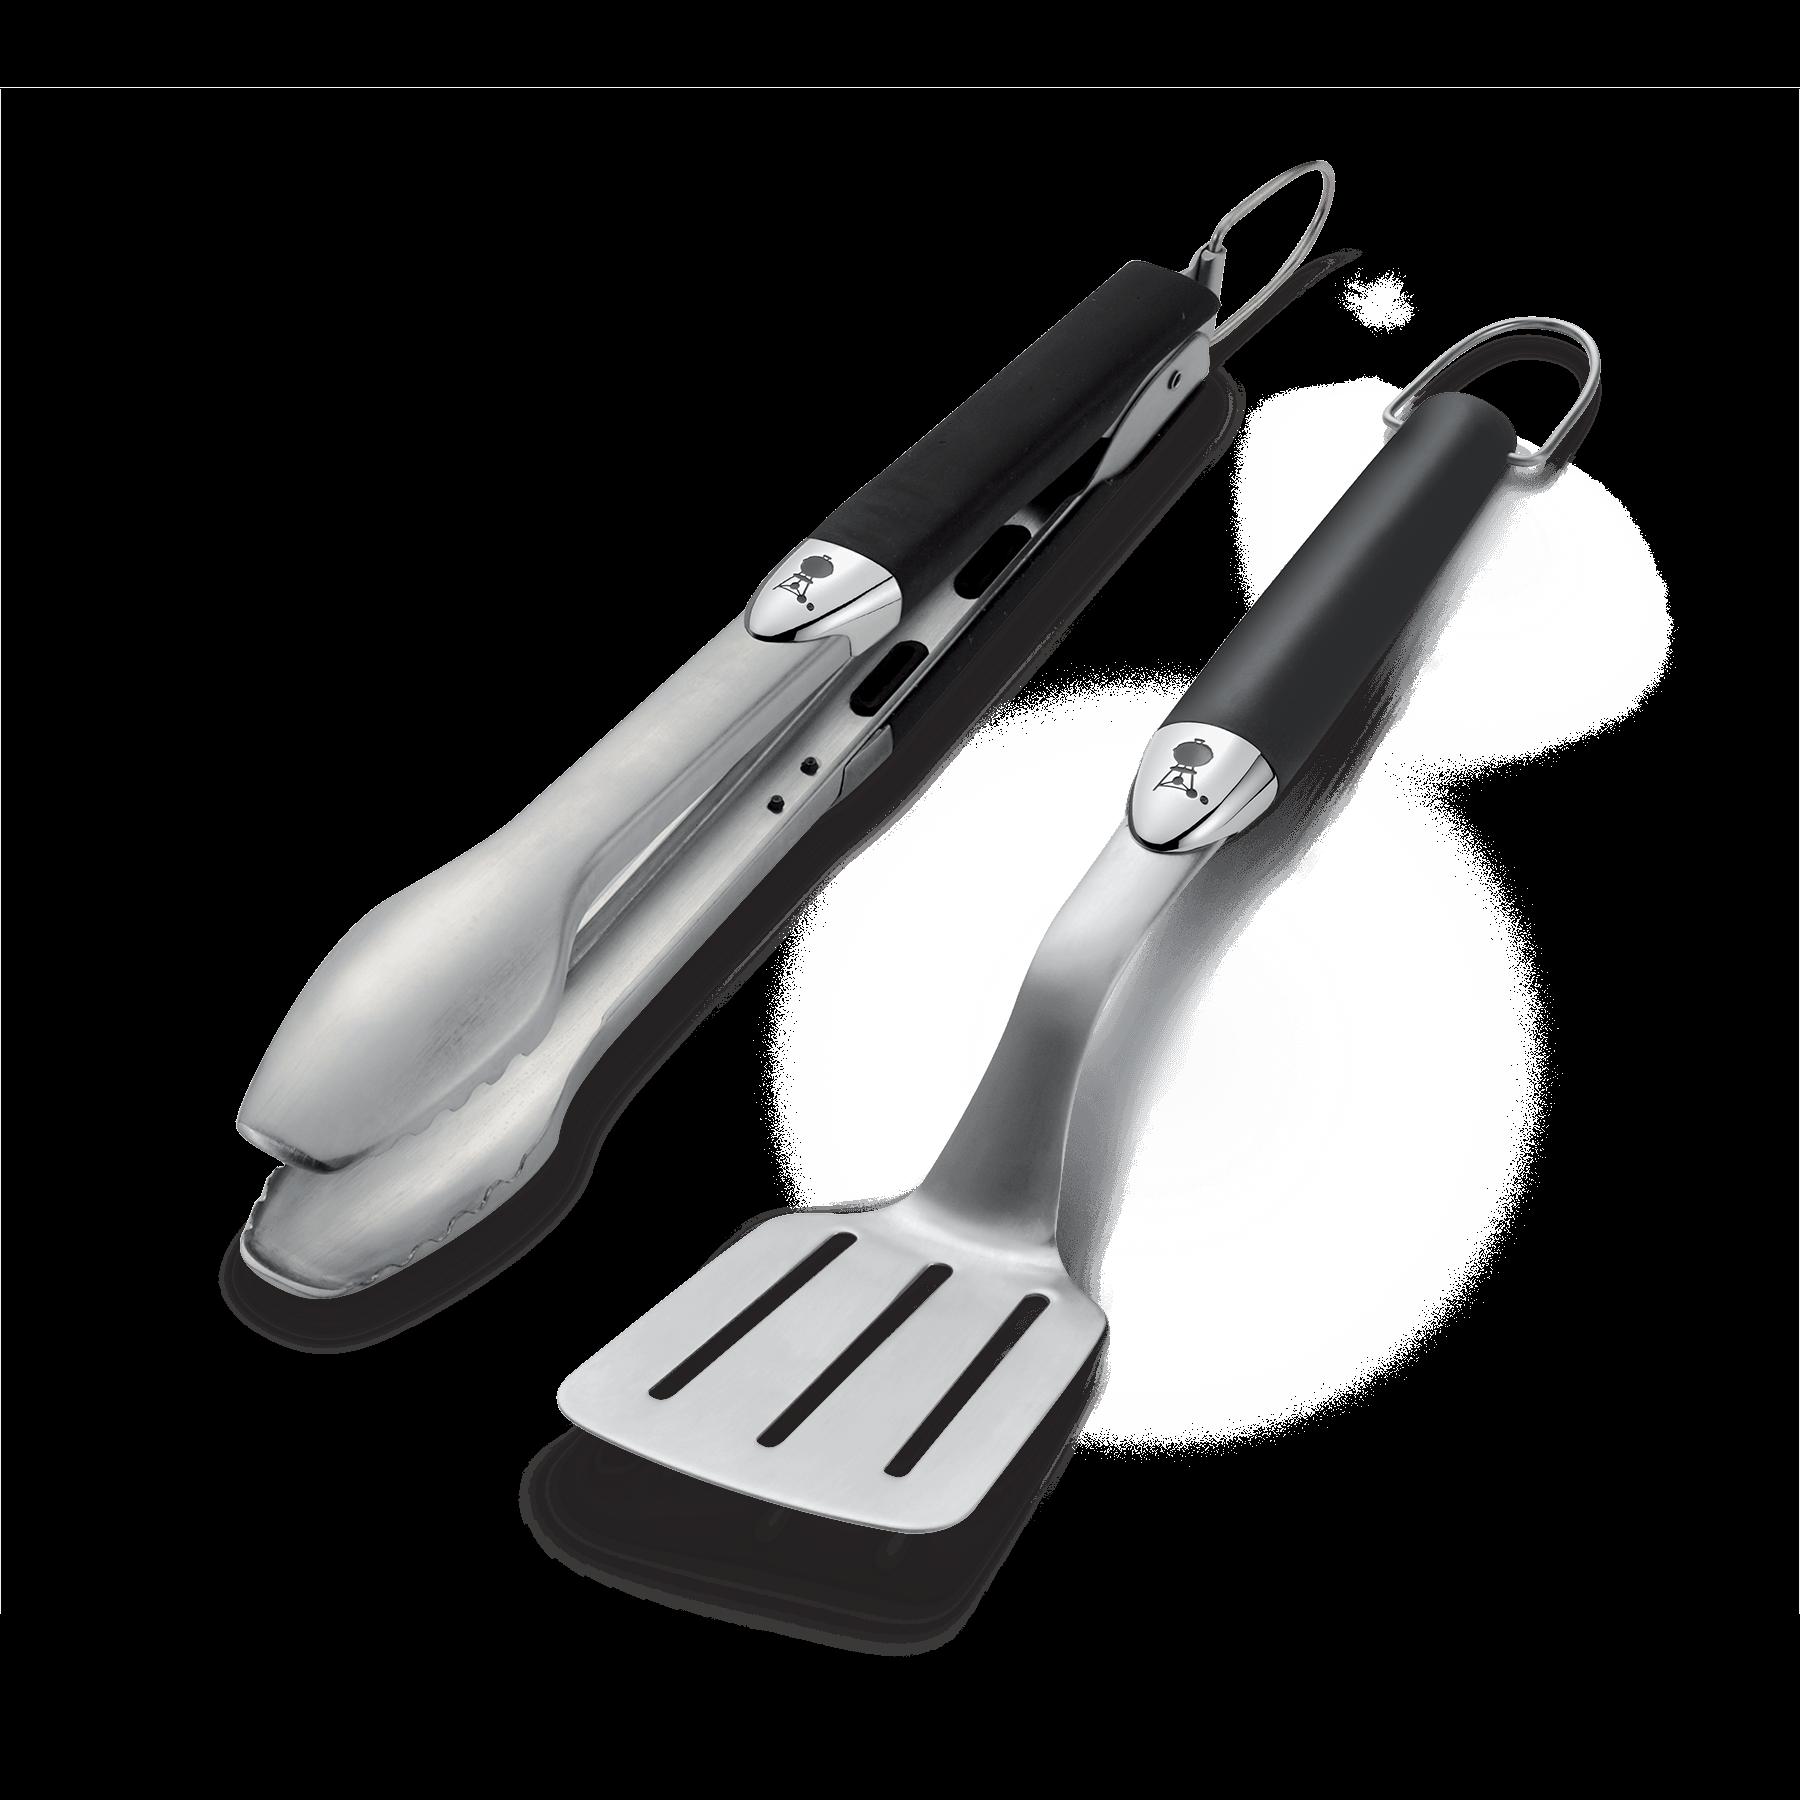 Weber Premium Tool set 2 accessoires